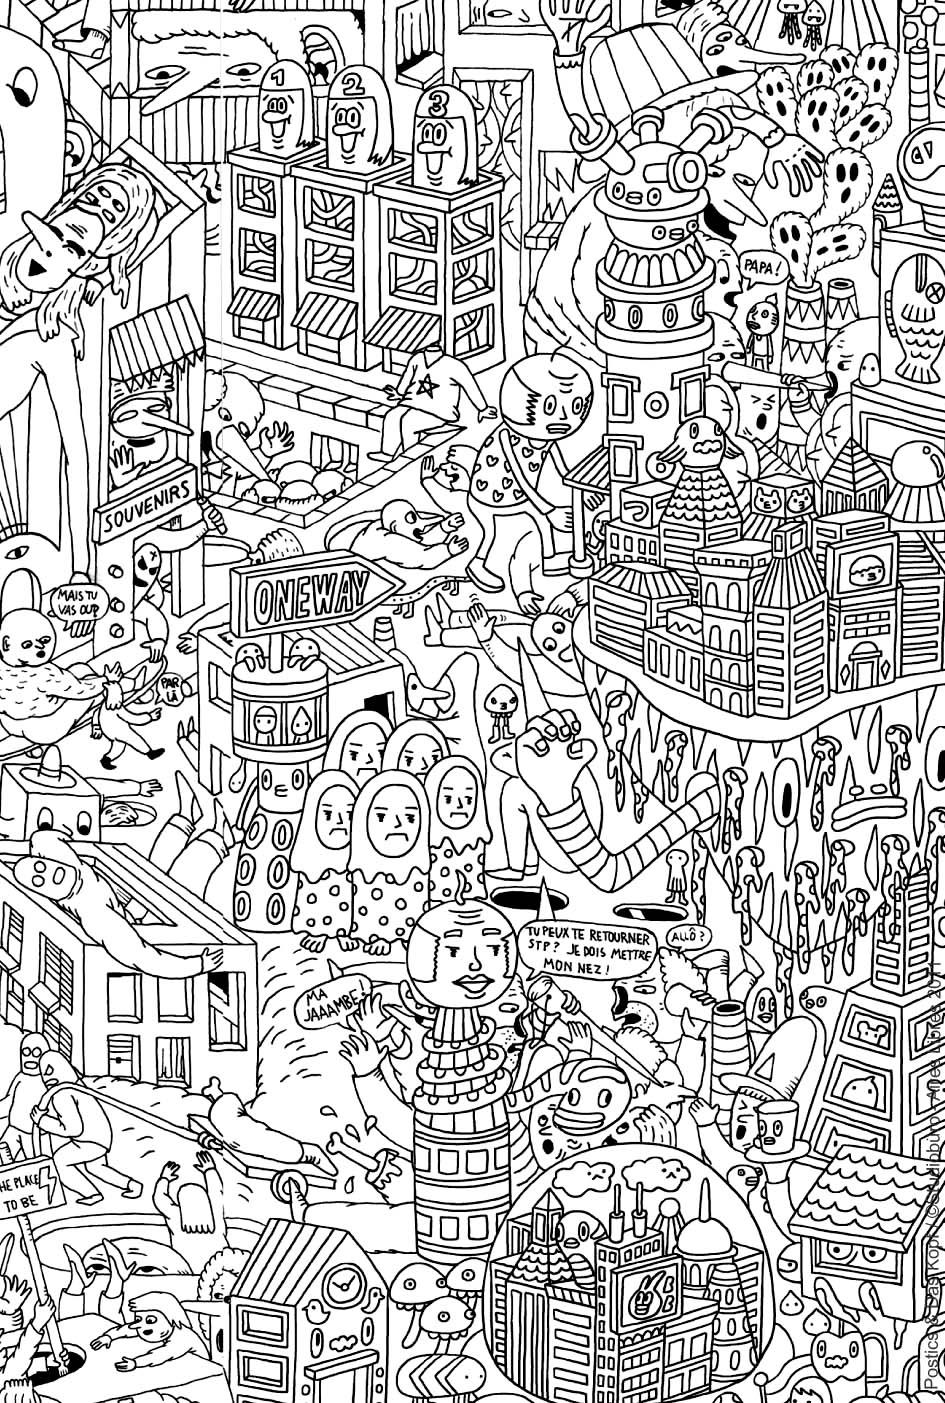 Doodling gribouillage doodle art 3 coloriage doodle art - Coloriage art ...